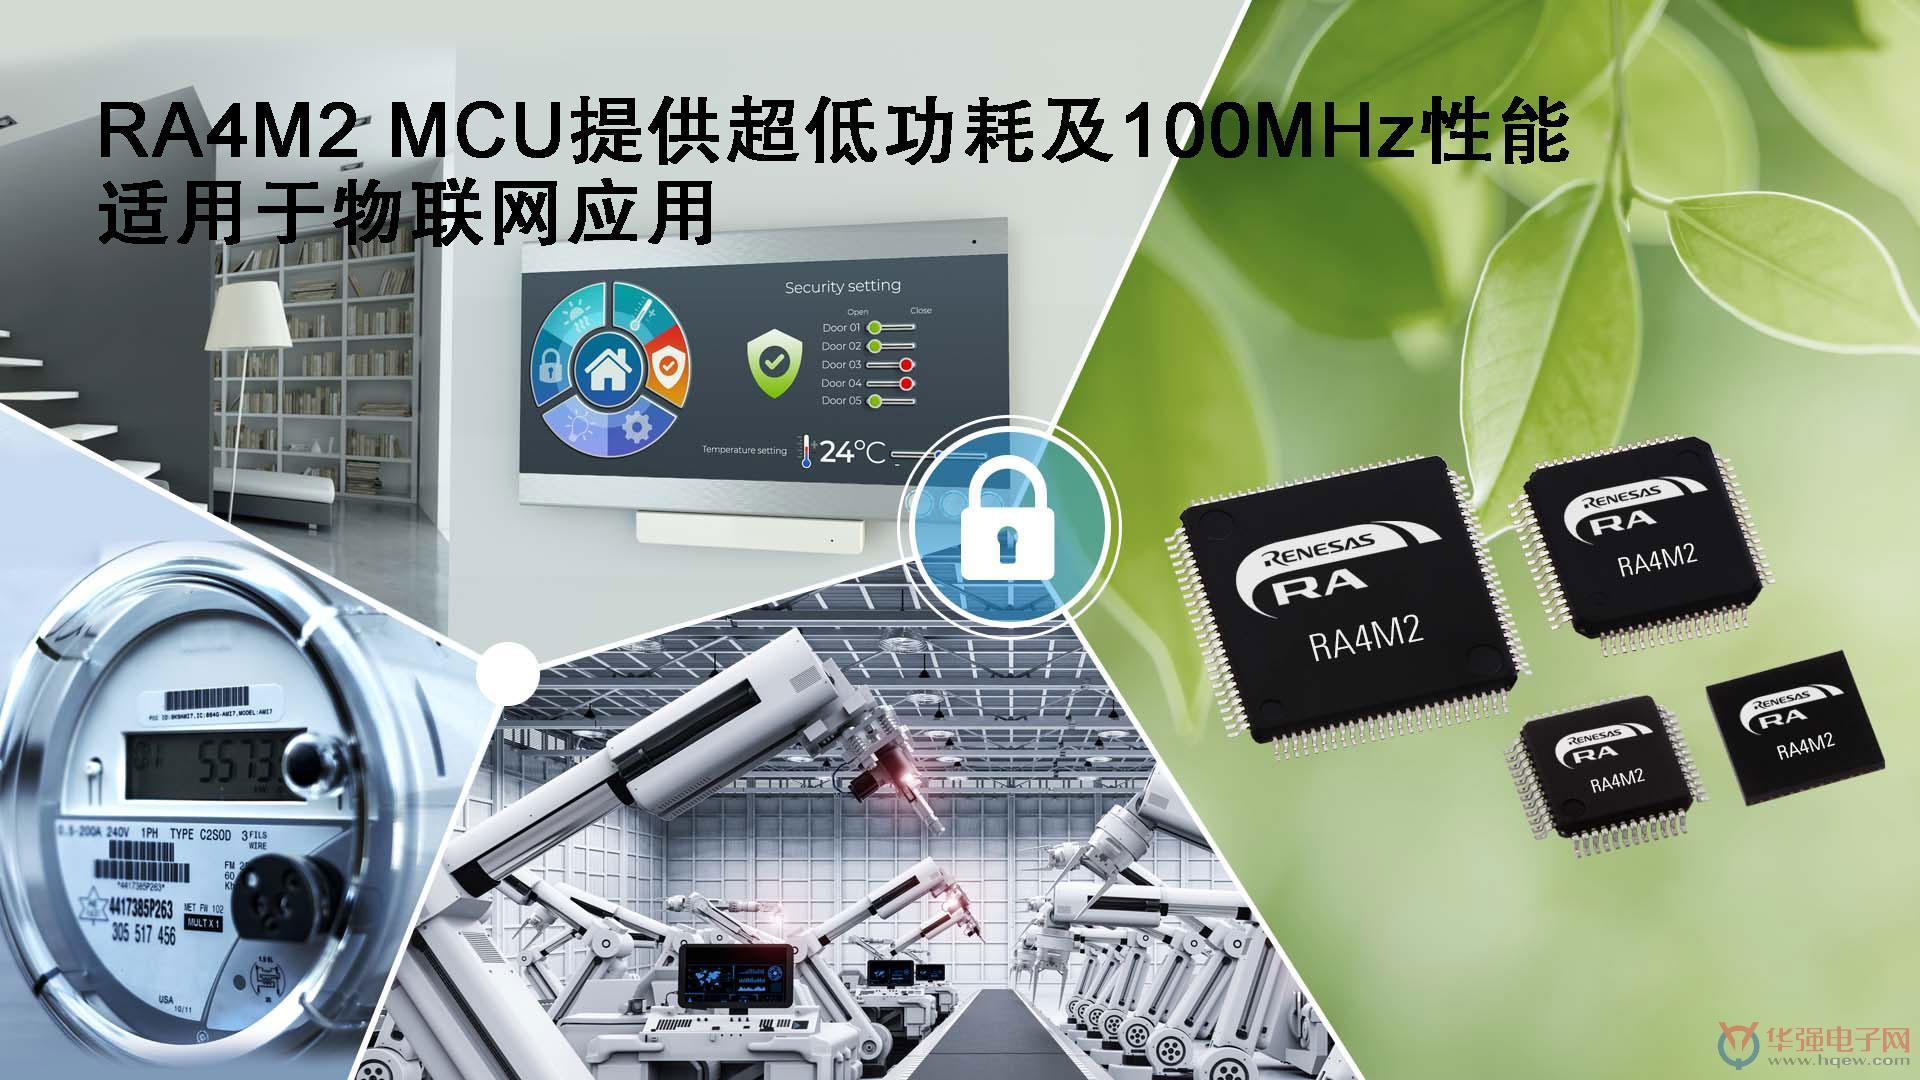 RA4M2-MCU提供超低功耗及100MHz性能,适用于物联网应用.jpg